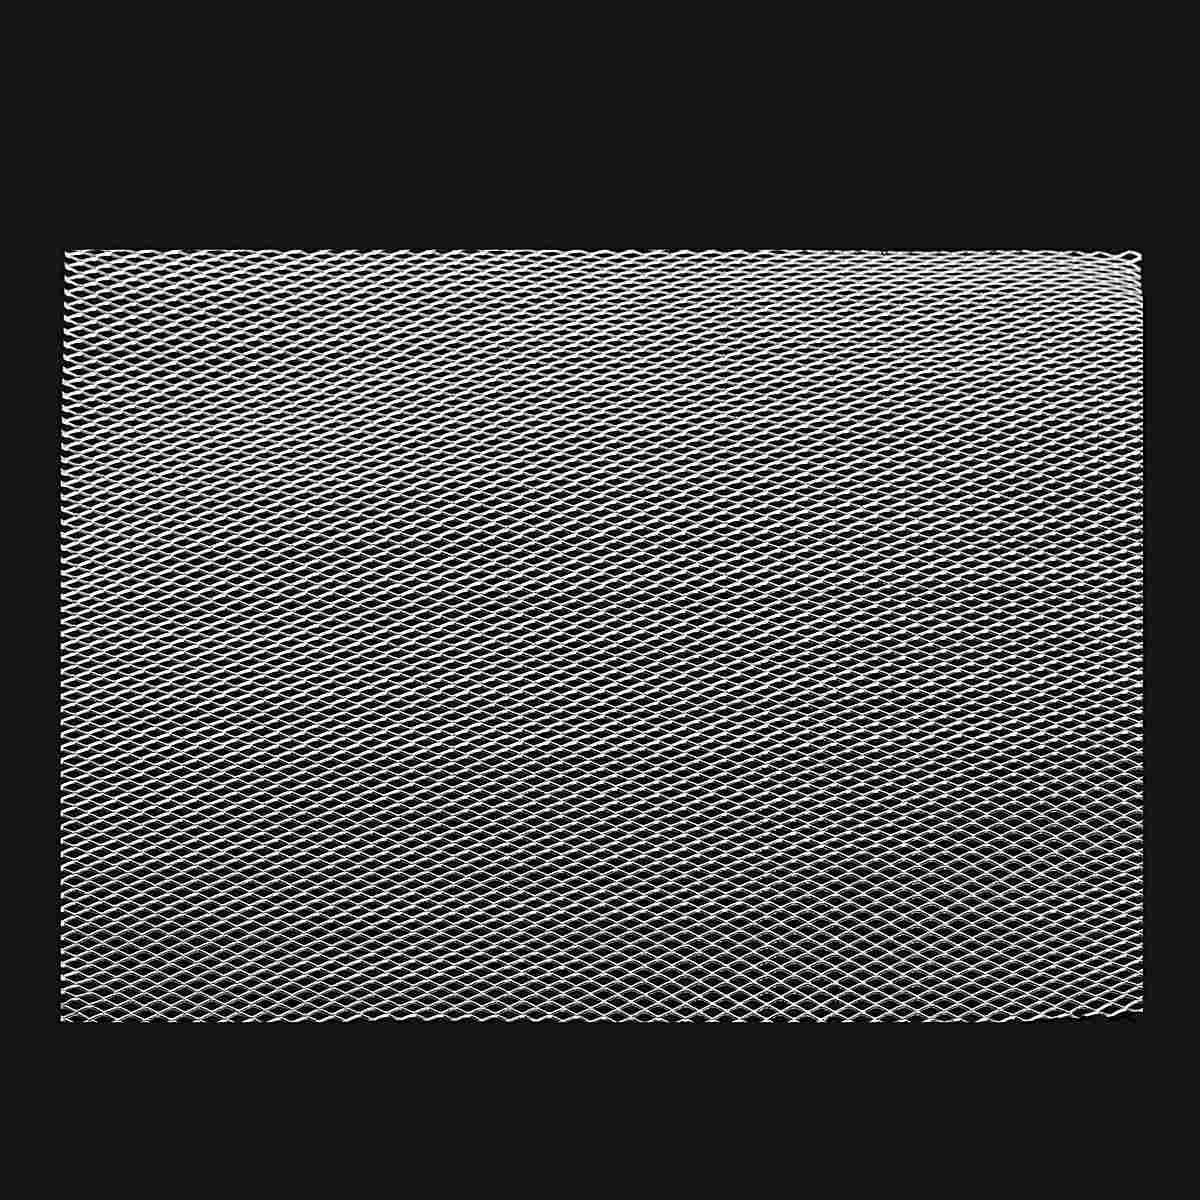 Aluminium Modelling Mesh Fine Medium And Coarse Appox 25cm By 20cm Sheets